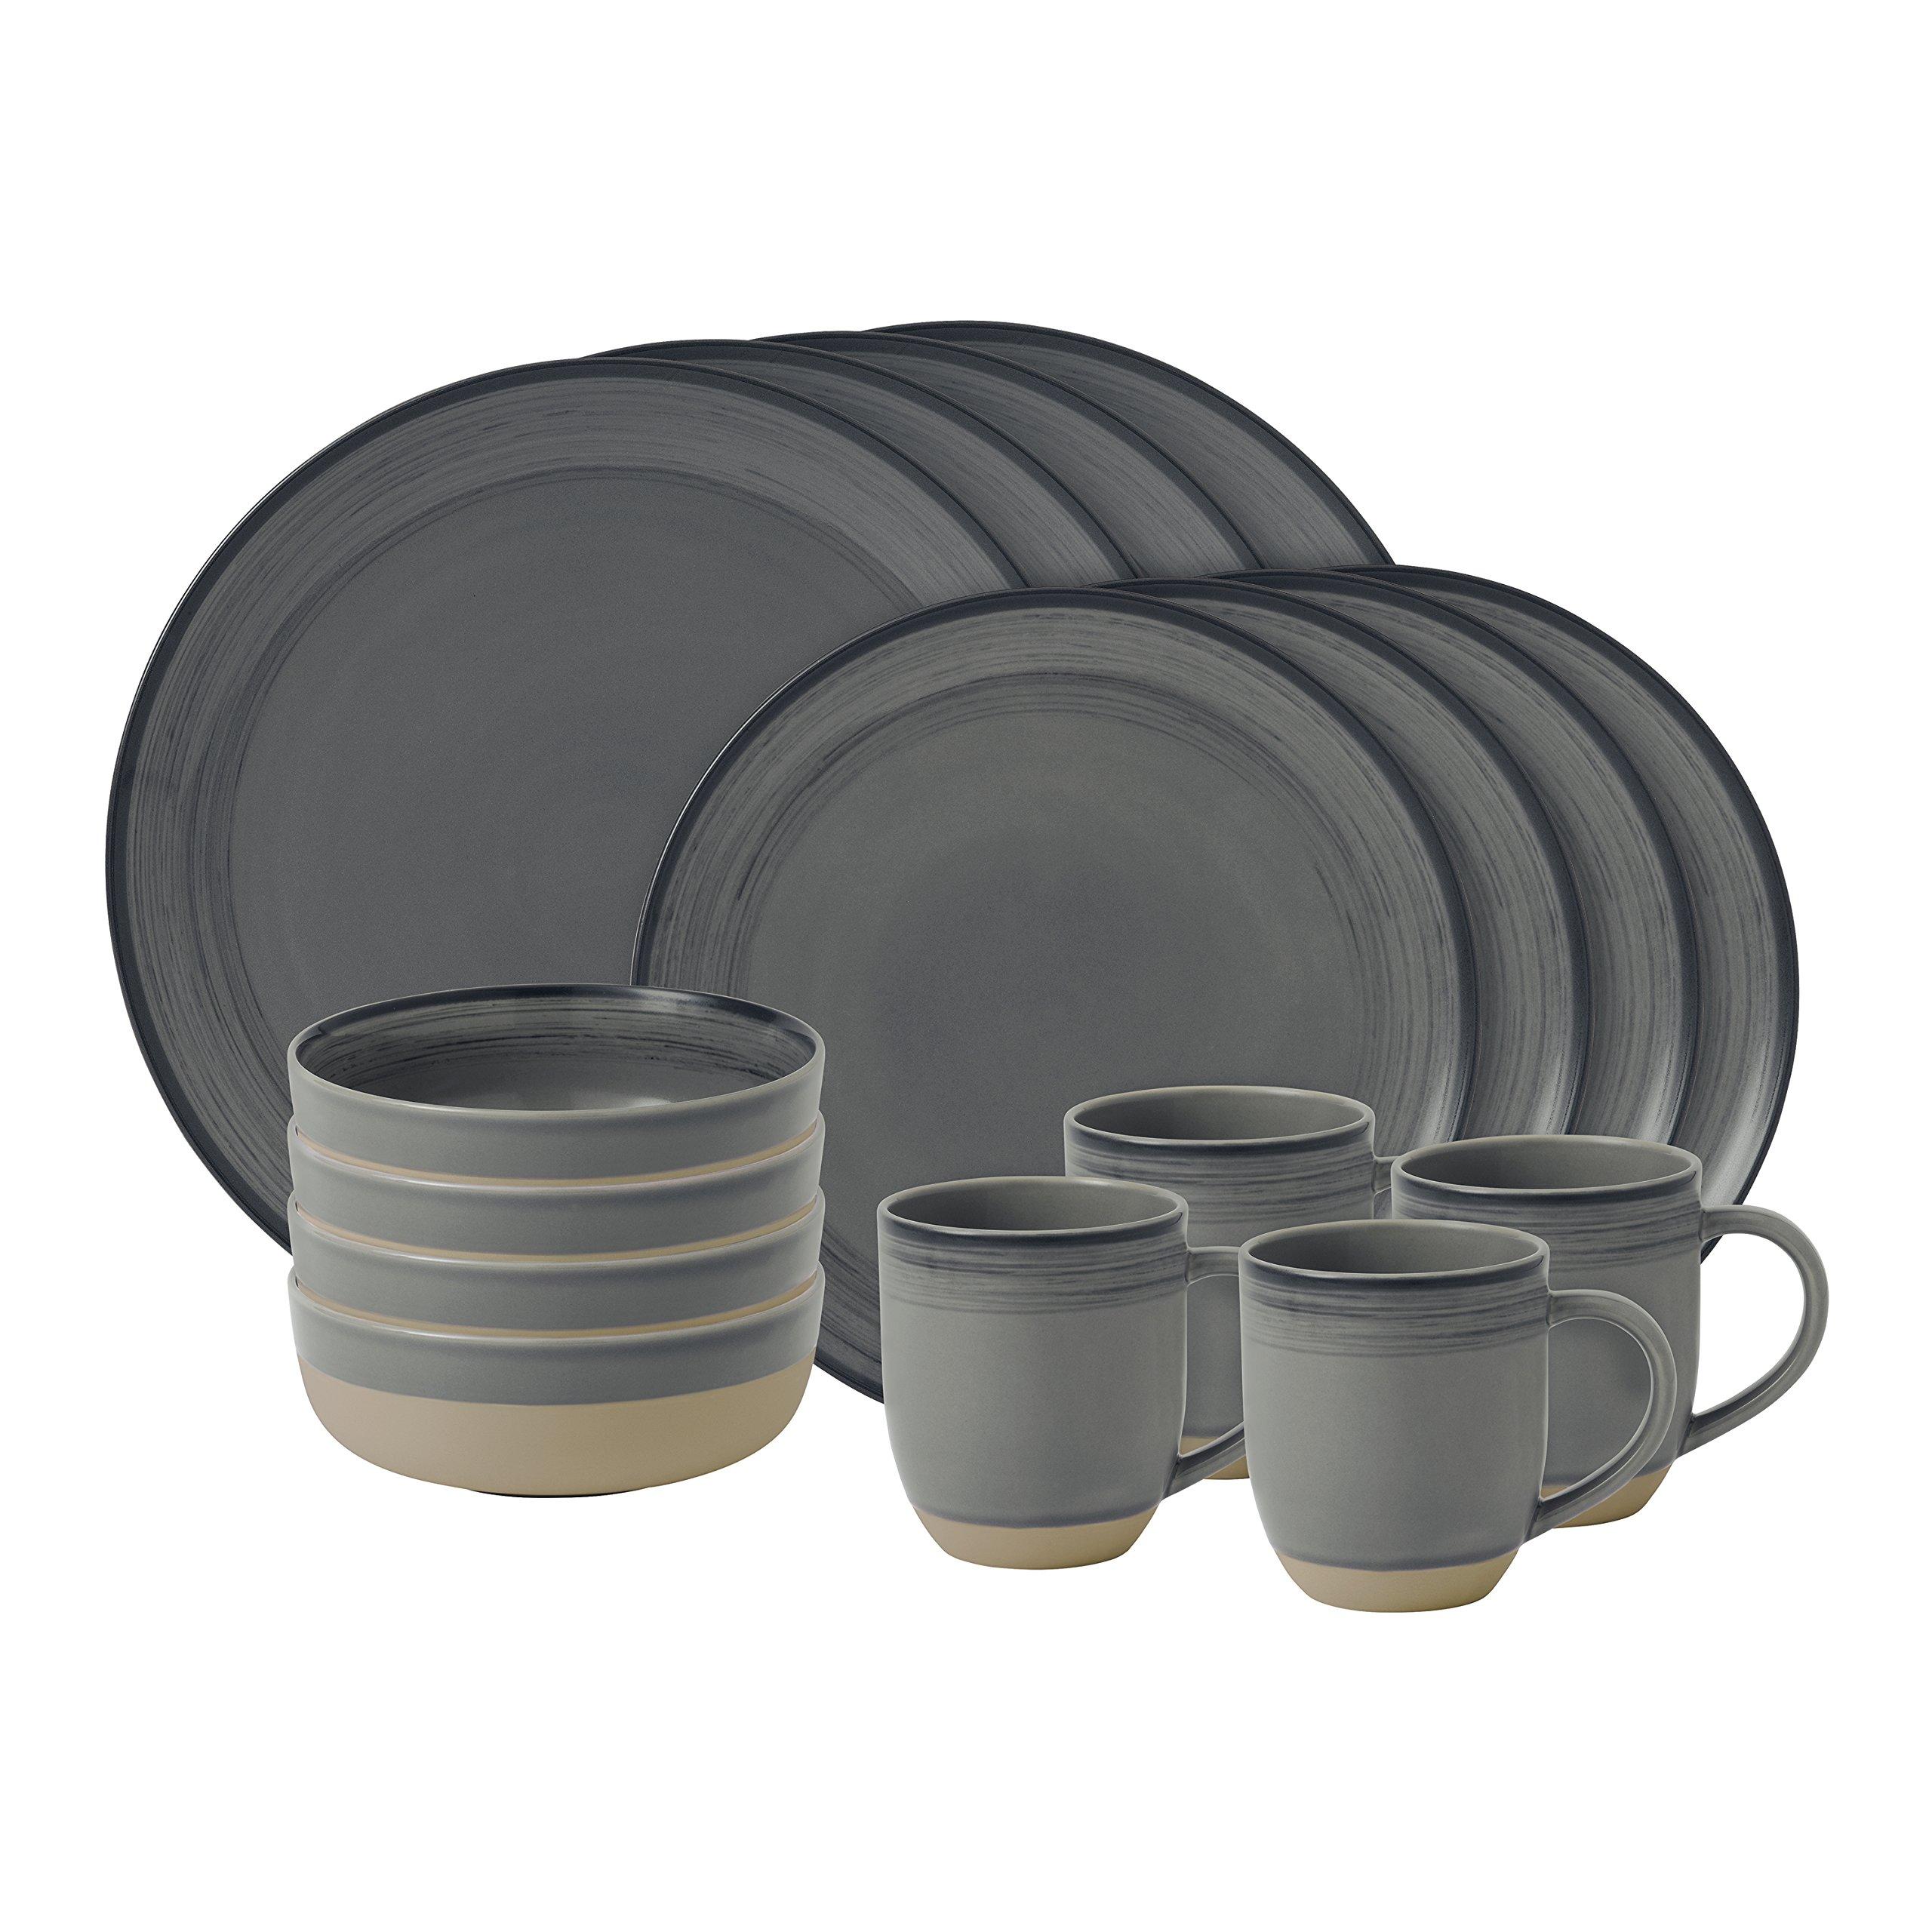 Ellen DeGeneres Brushed Glaze Charcoal Grey 16pc Set